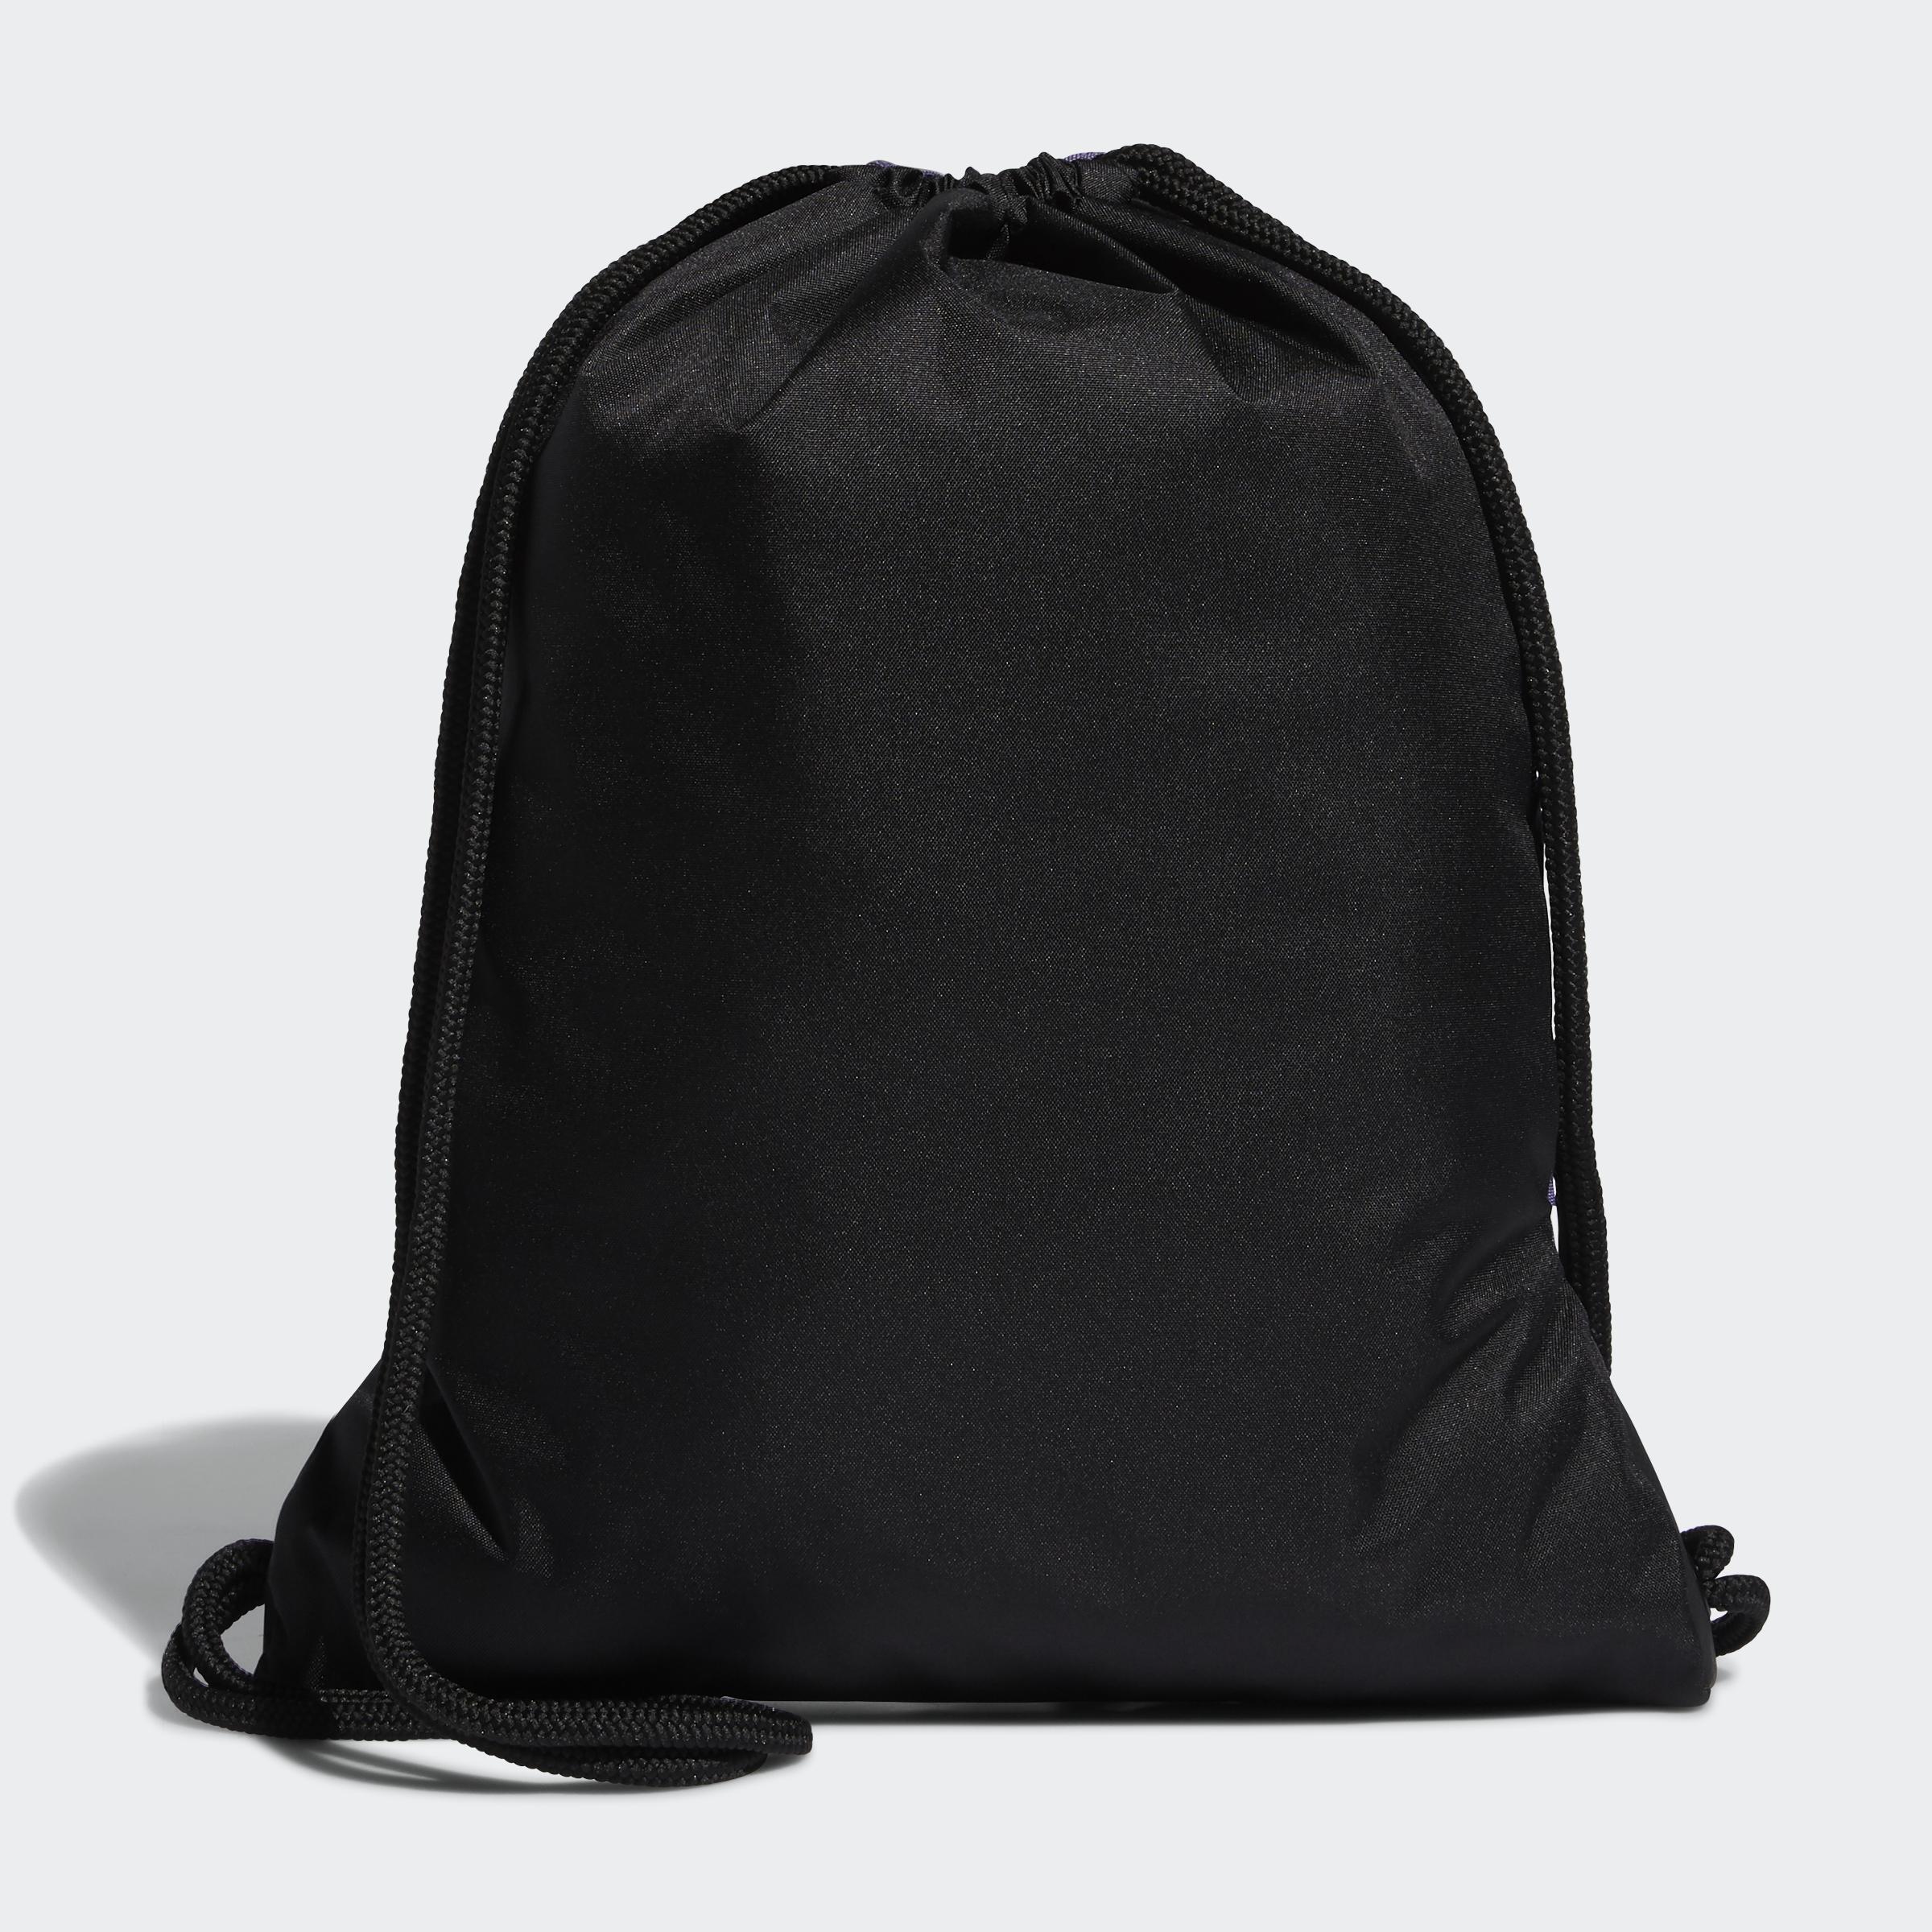 adidas-Classic-3-Stripes-Sackpack-Bags thumbnail 12